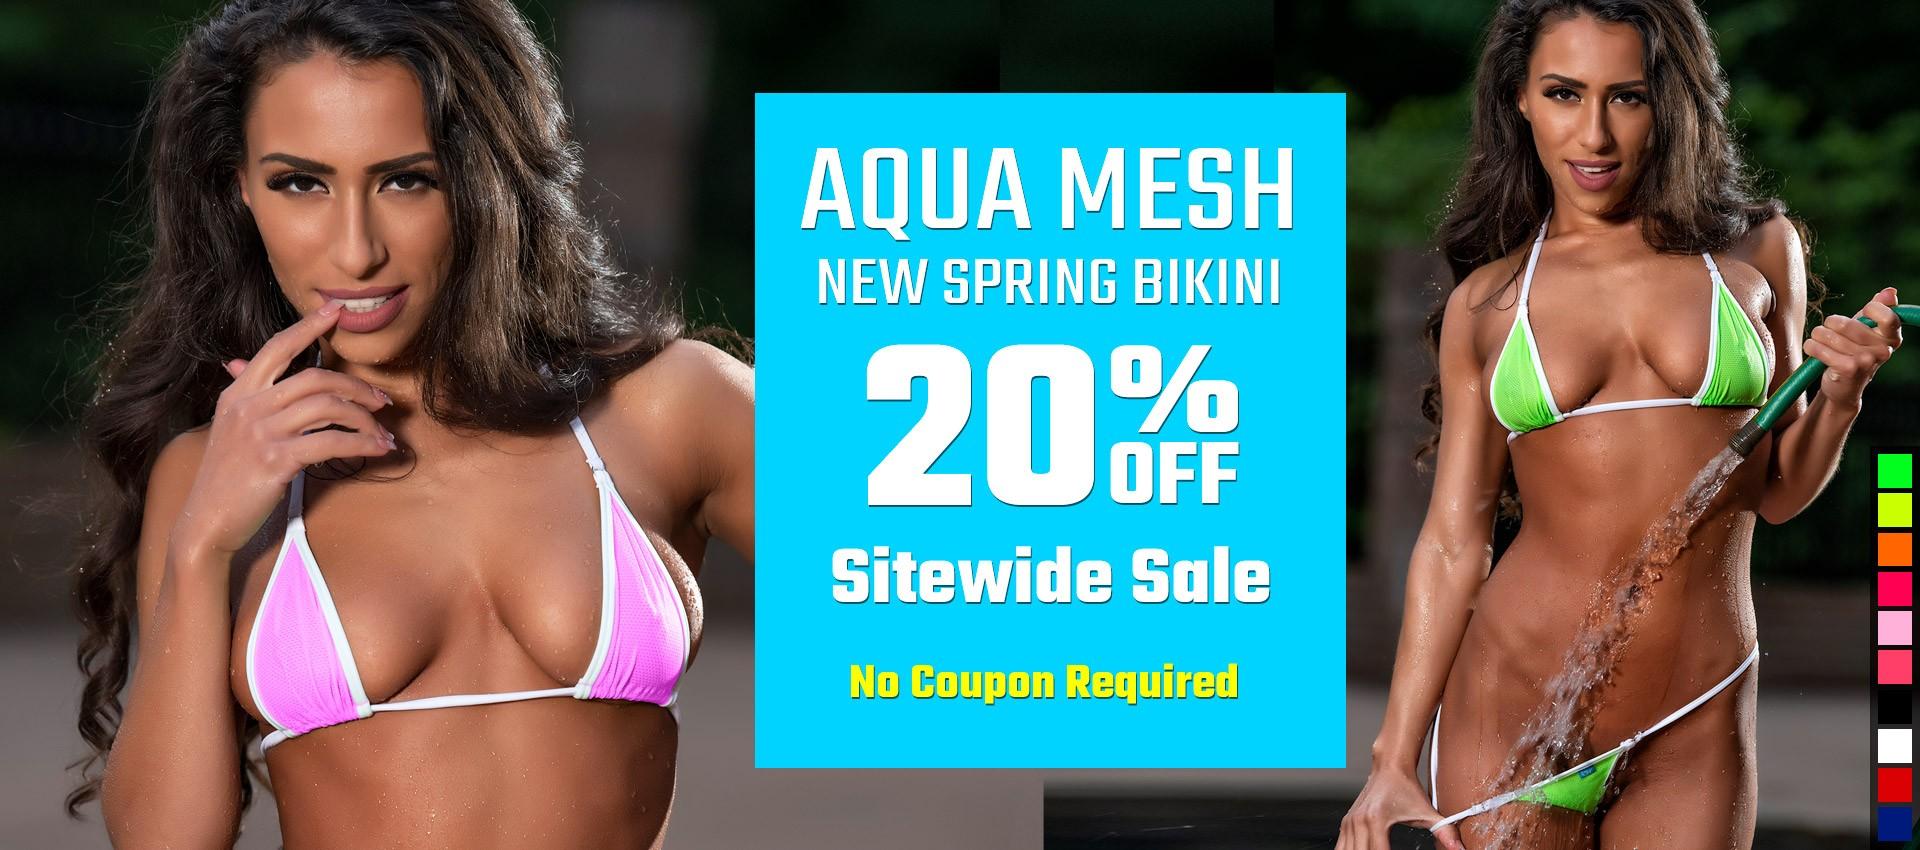 Spring 20% Sitewide Sale and NEW Aqua Mesh Bikini